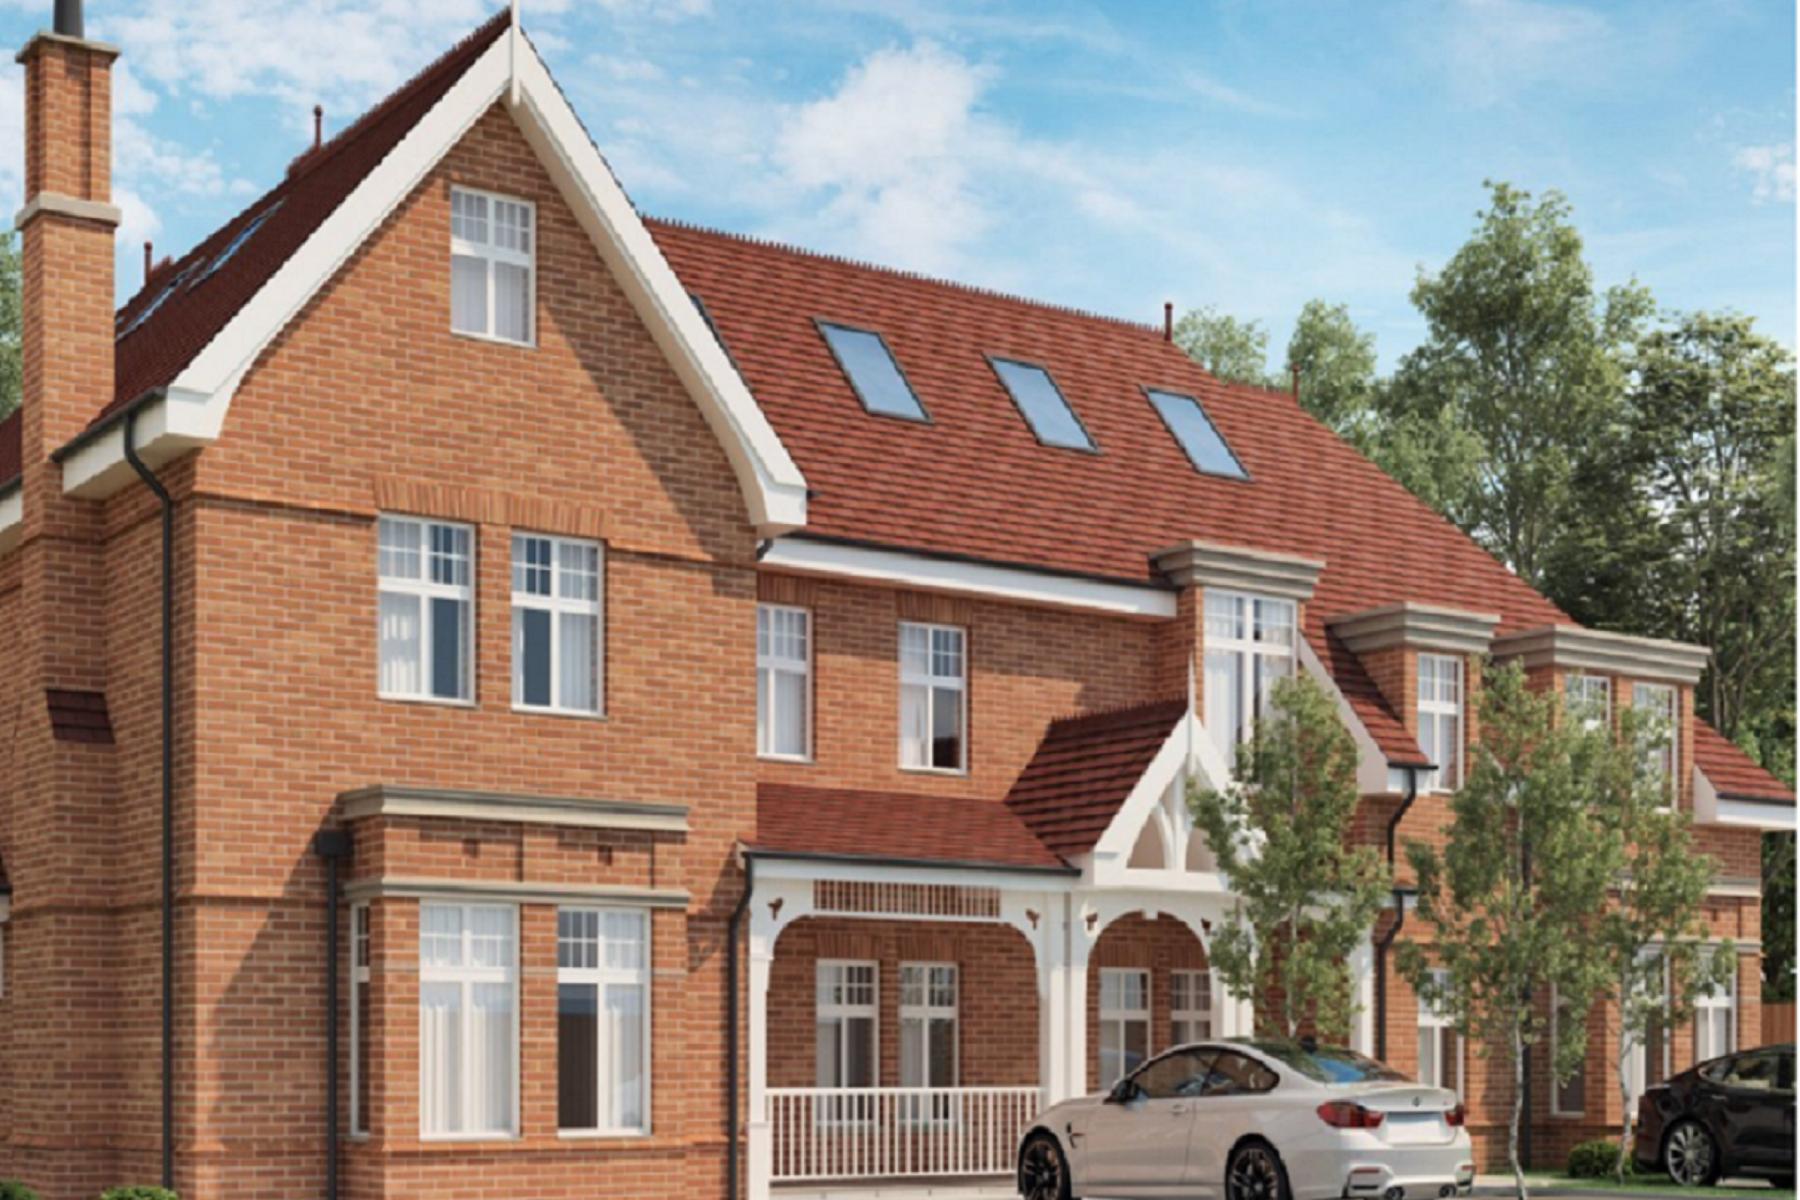 Single Family Homes for Sale at 1 Grey Squirrel Mews, Leatherhead Road Oxshott, England KT22 0EX United Kingdom